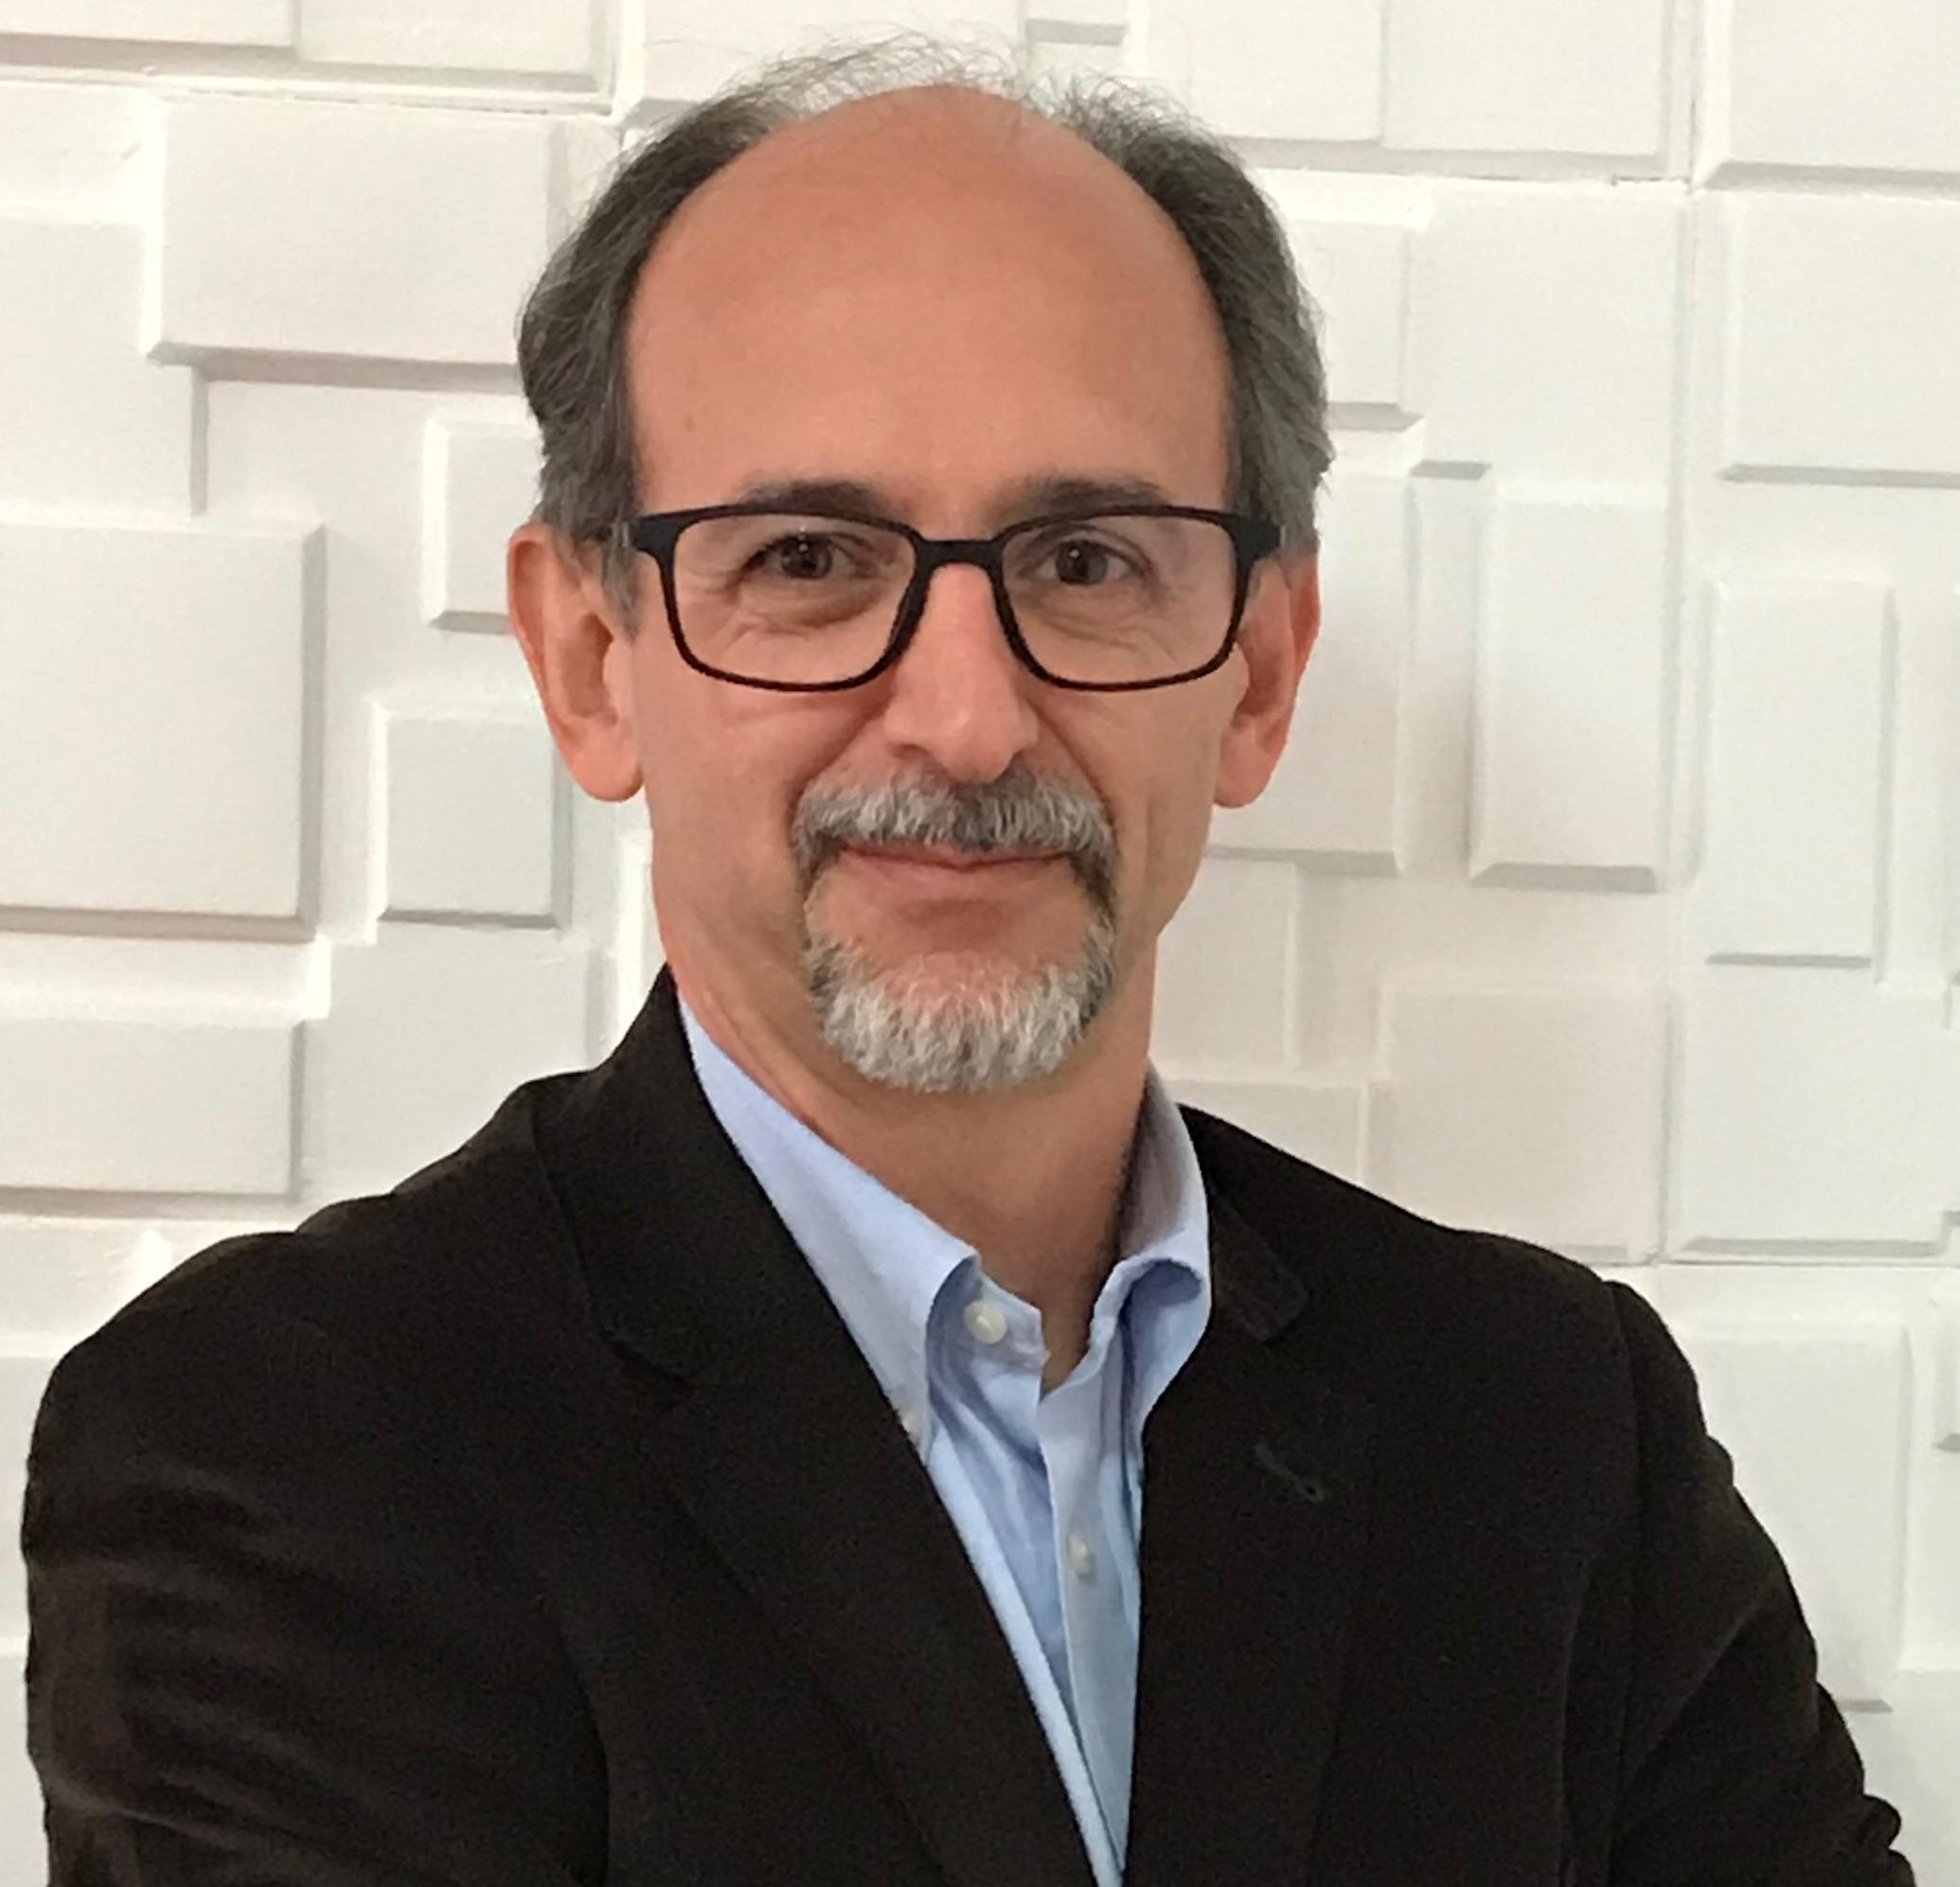 Colunista João Roncati